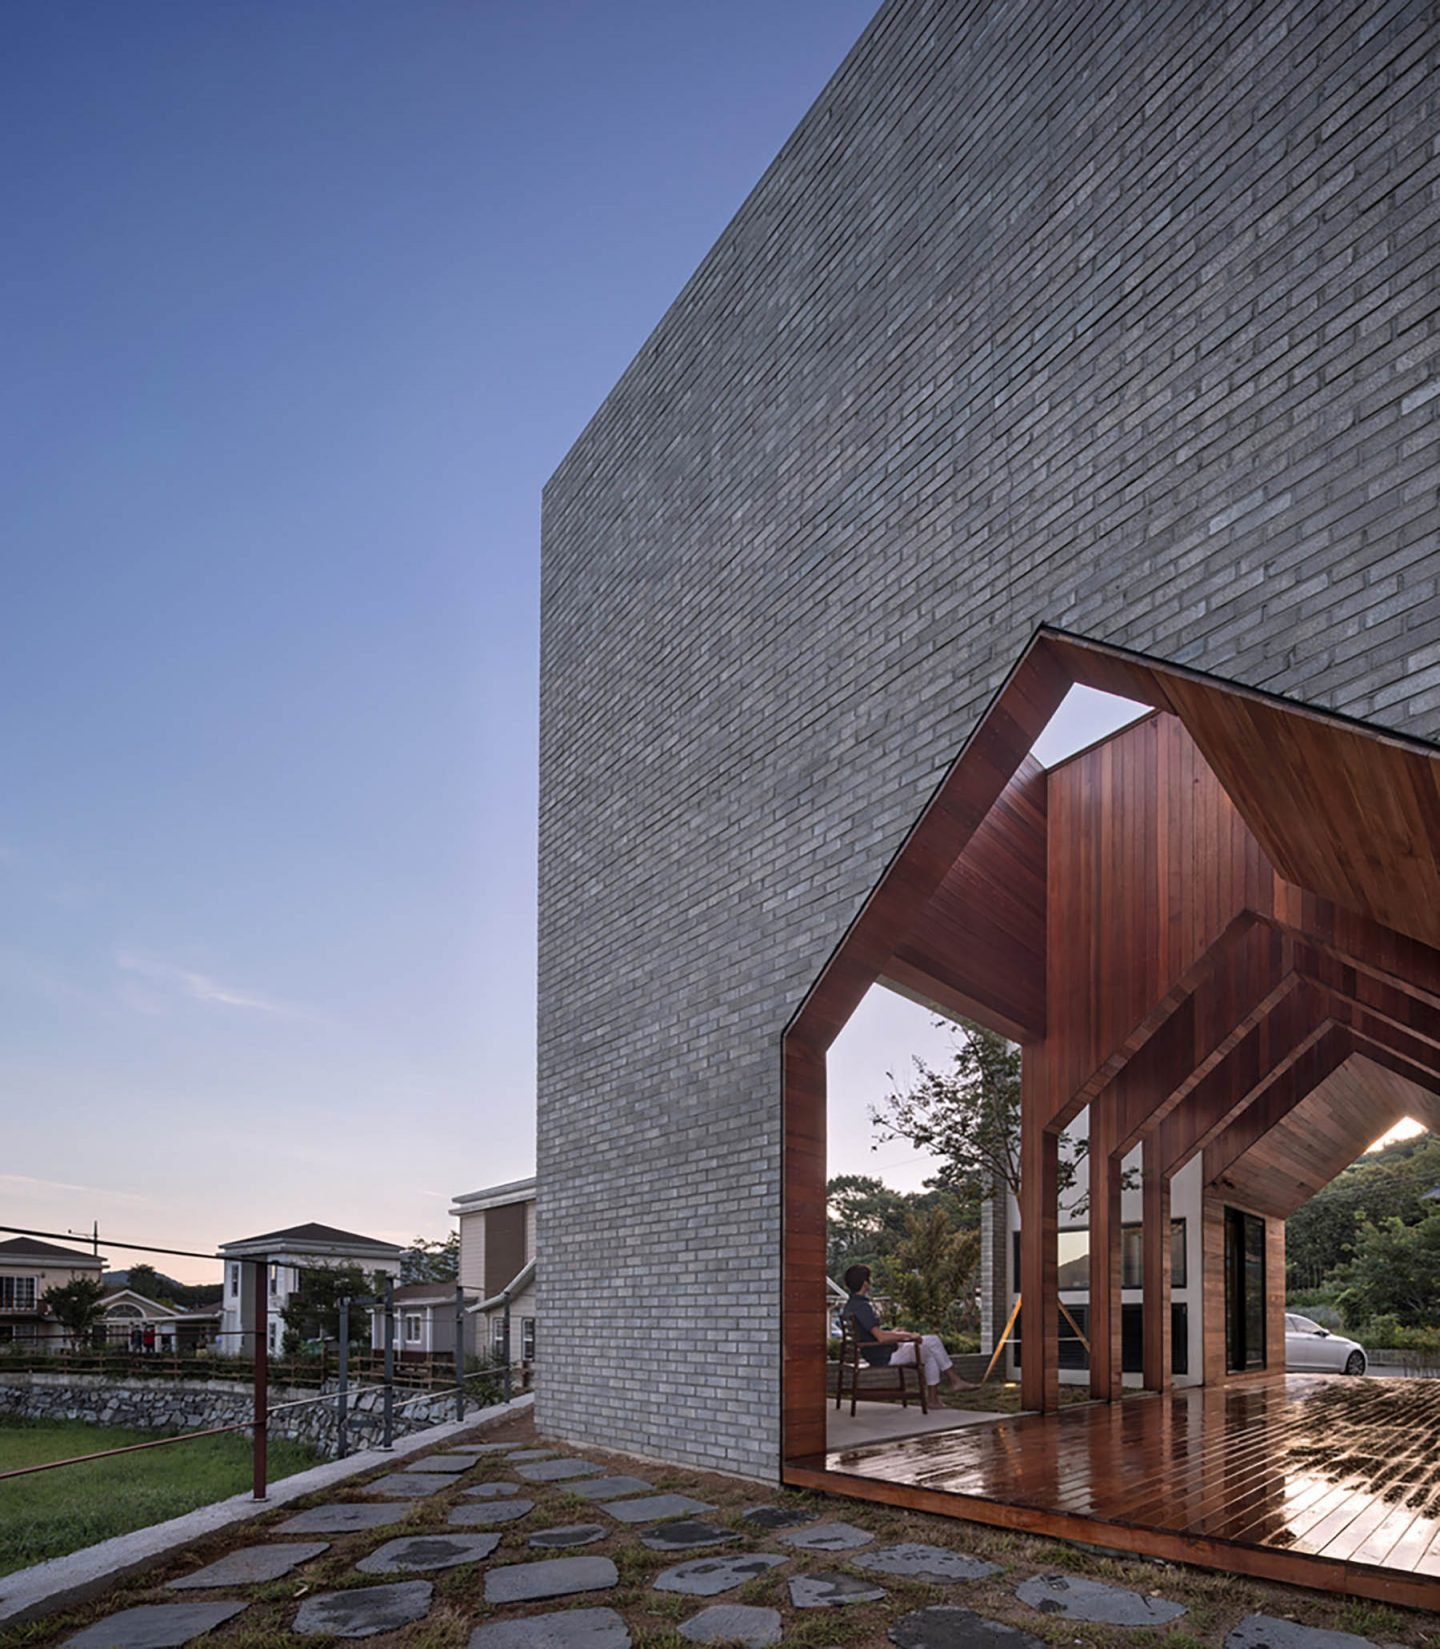 iGNANT-Architecture-Rieuldorang-Atelier-Manhwaricano-House-13